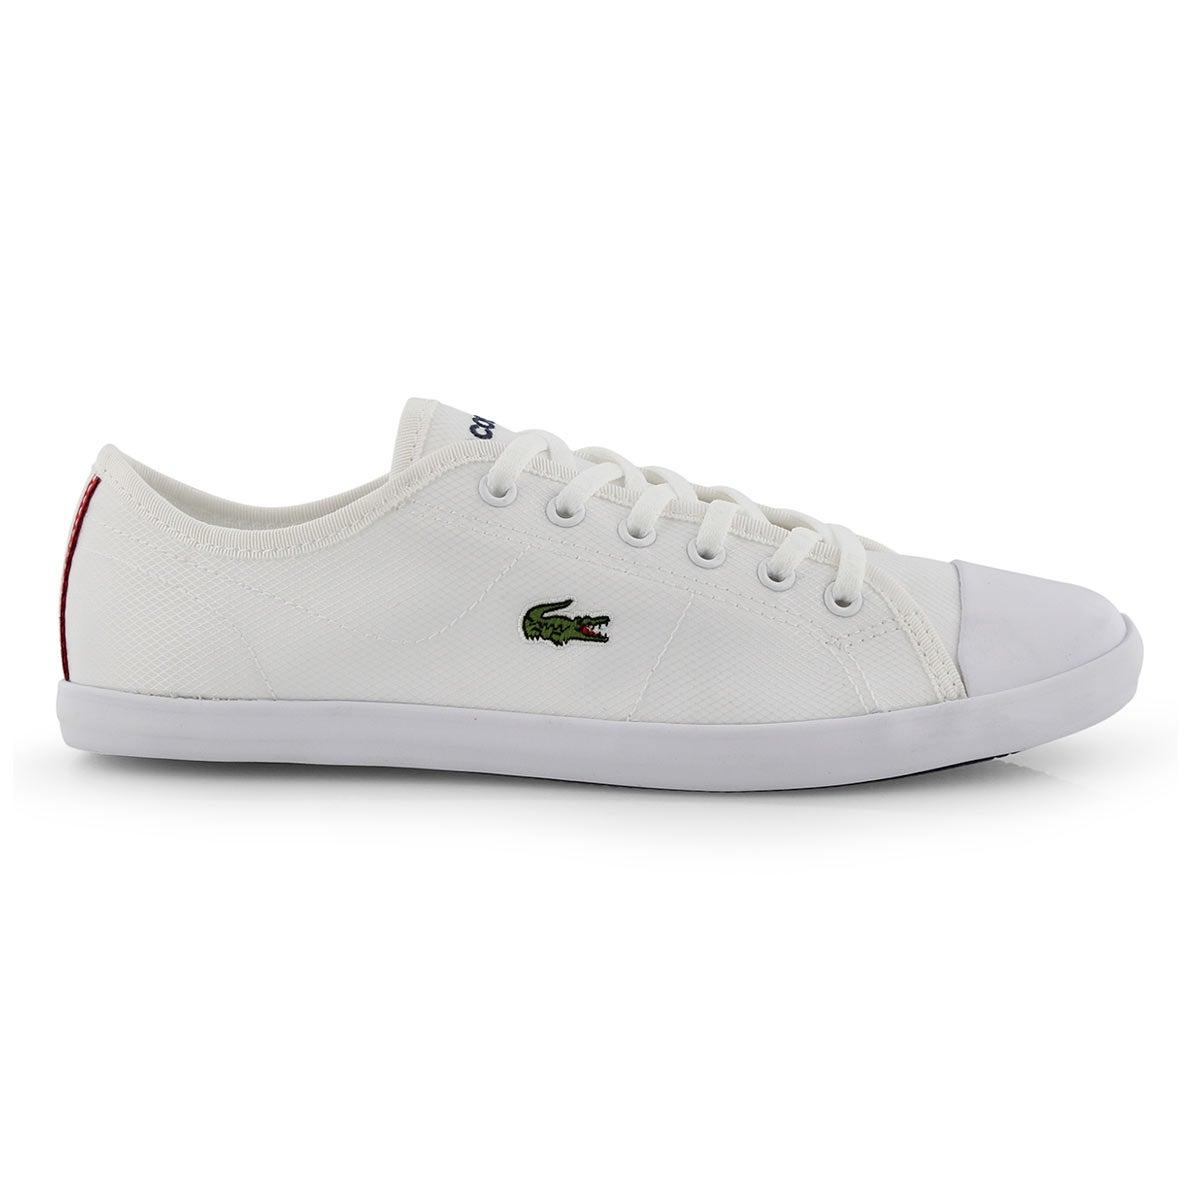 Lds Ziane Sneaker119 1 wht/wht lace up